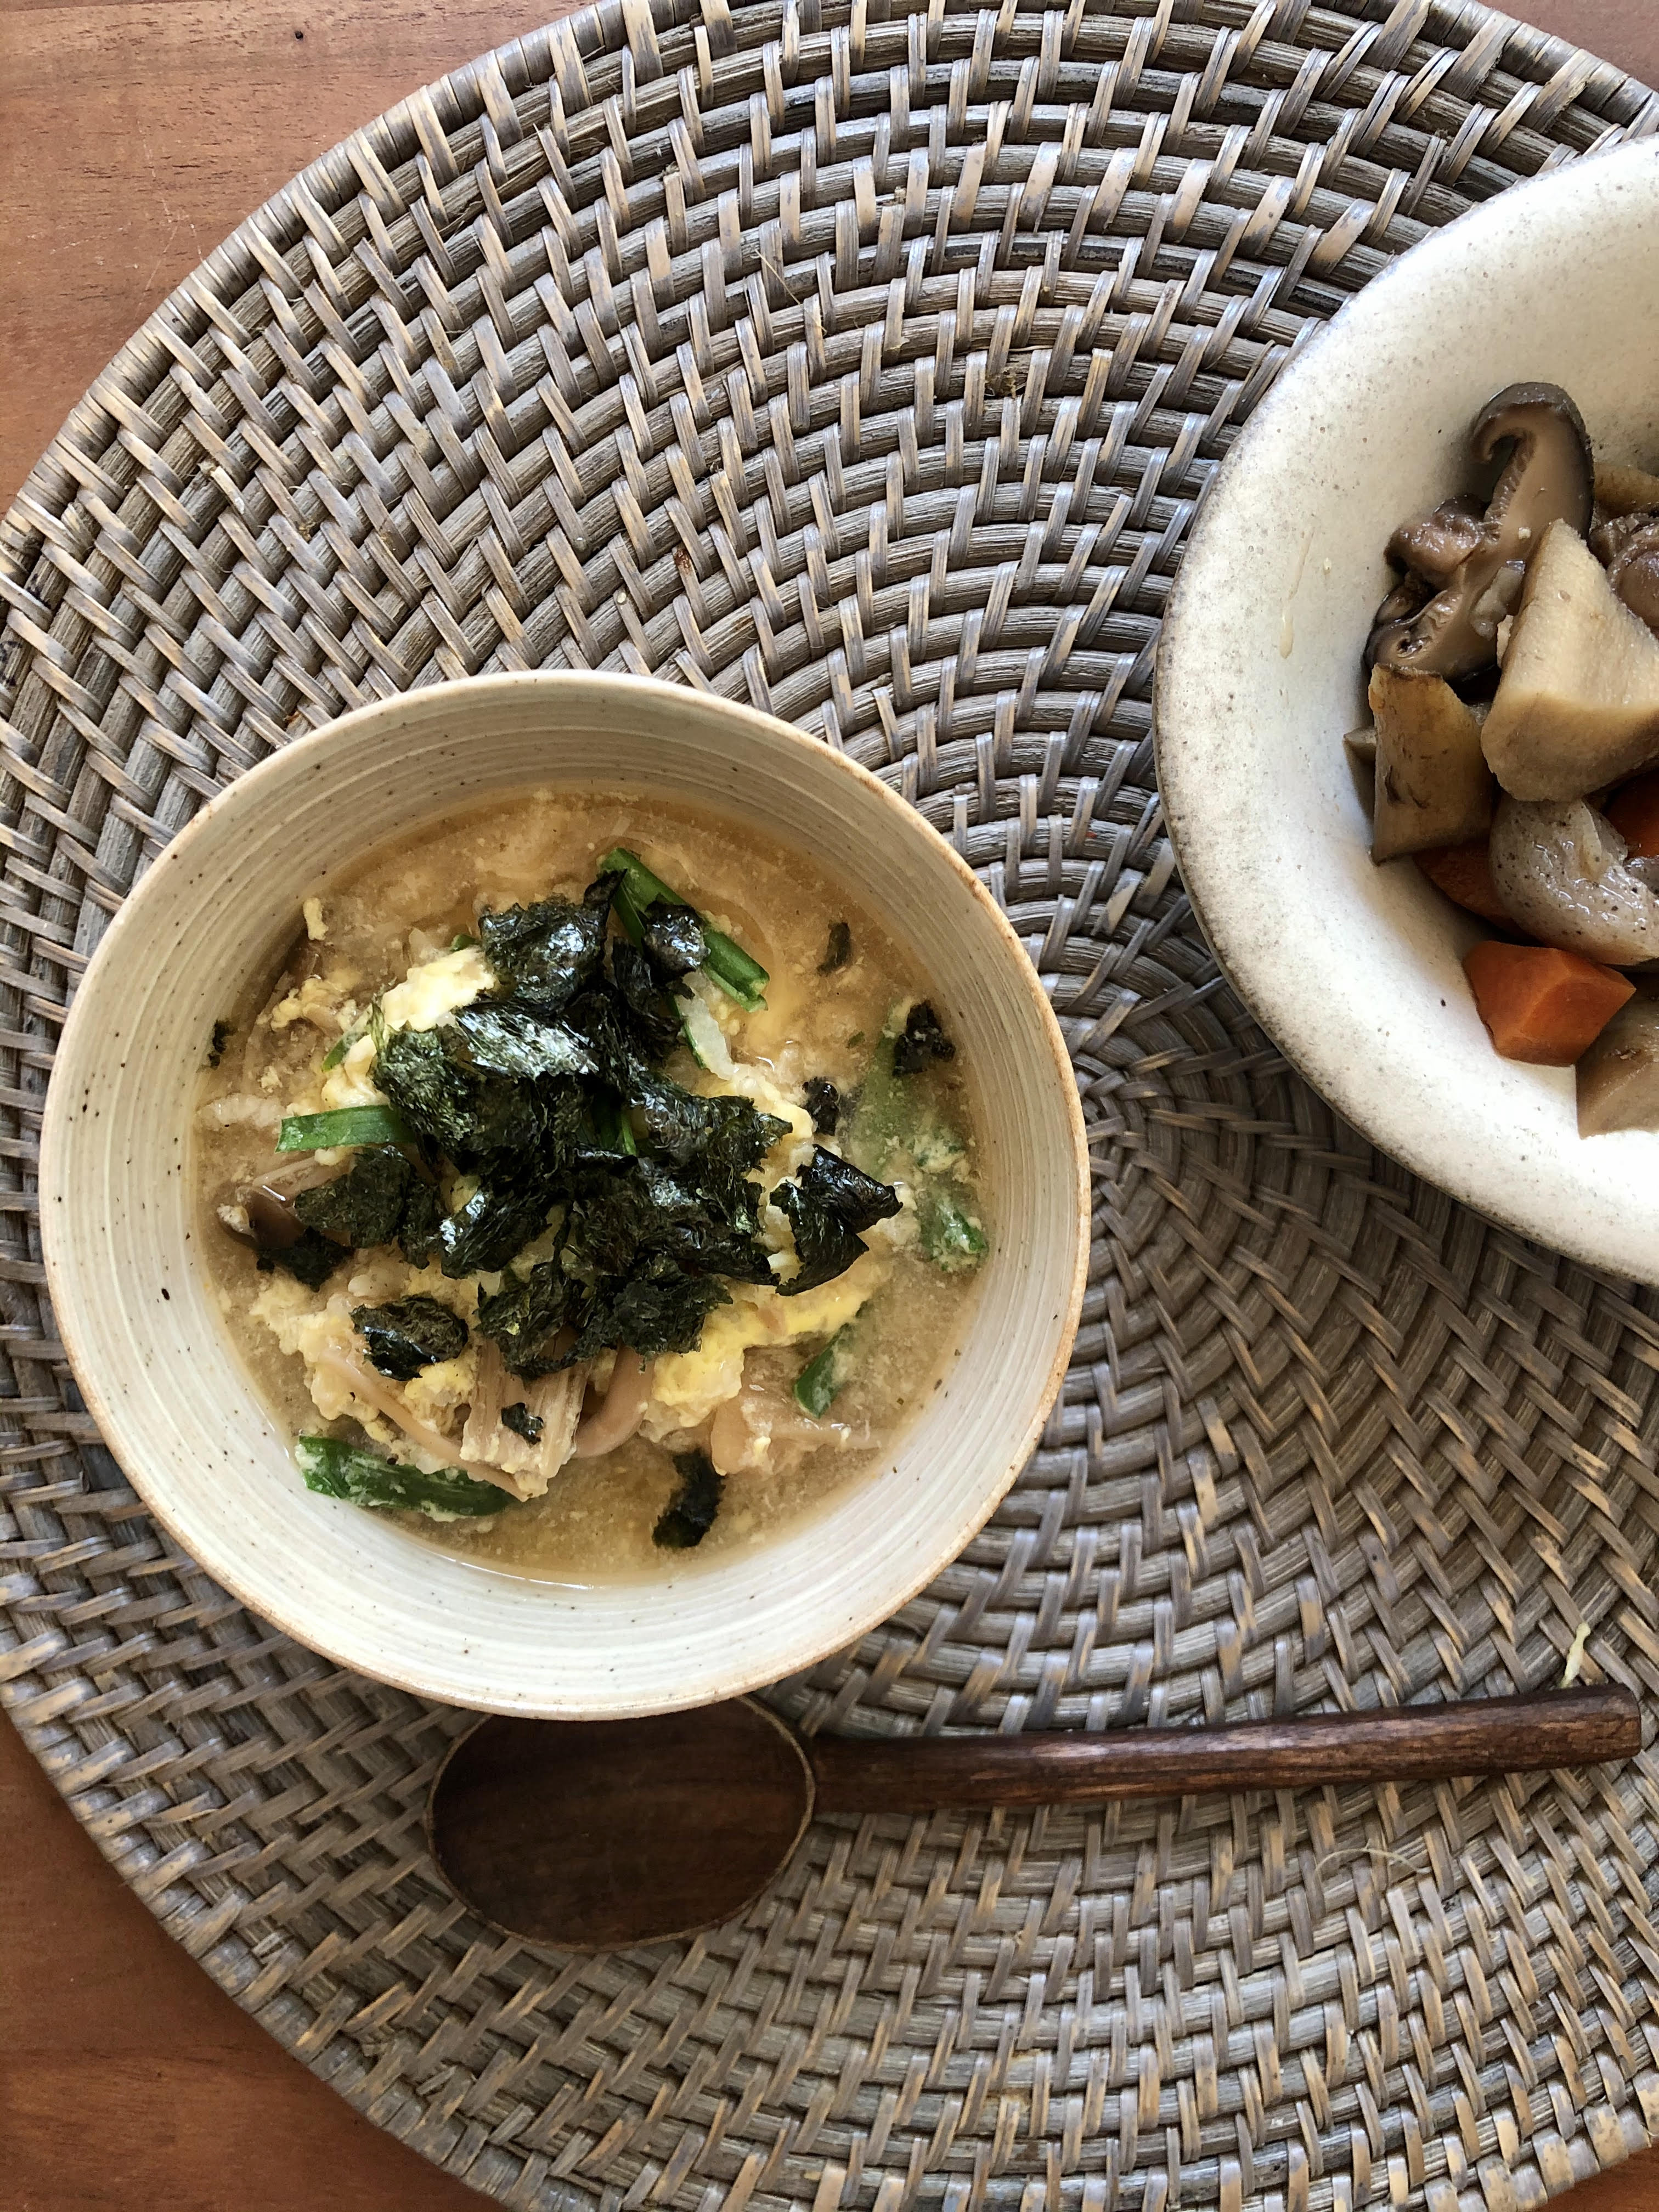 Cook Authentic Japanese Dishes | Teriyaki, Okonomiyaki, Gyoza, Sushi, & More | Vegan & Vegetarian-Friendly 4